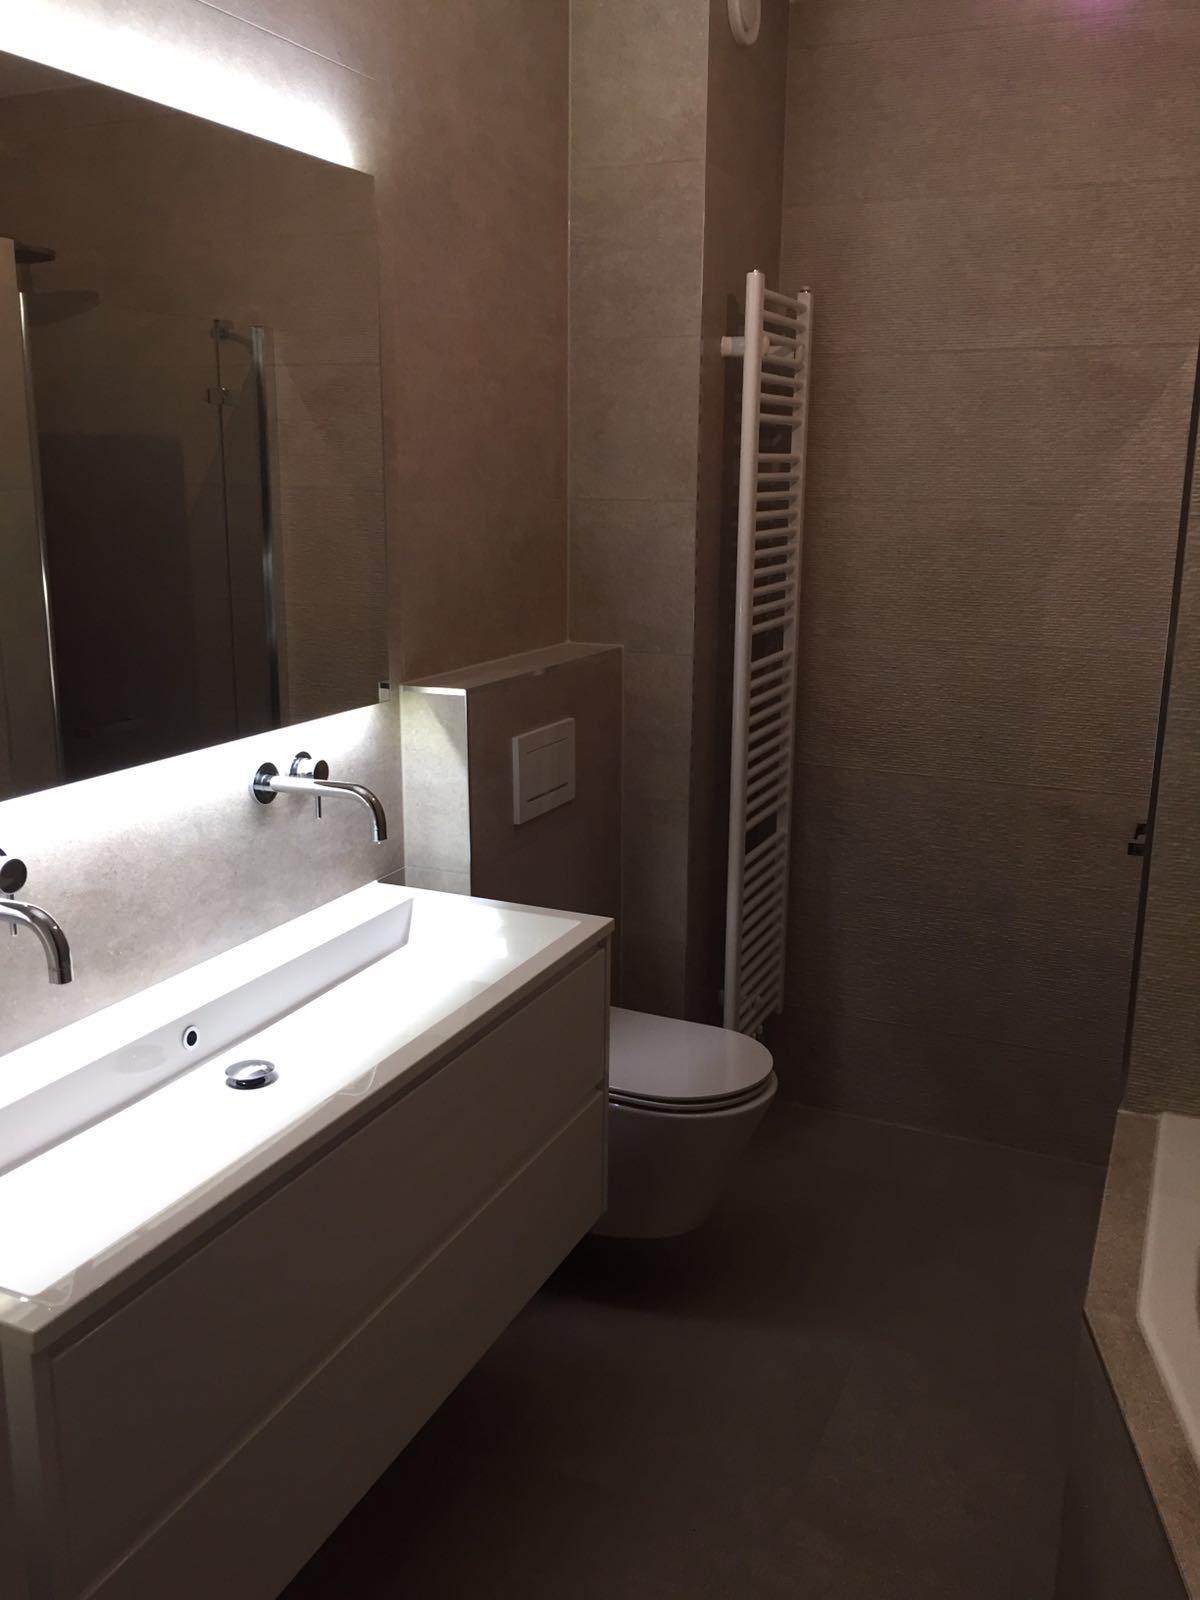 Badkamer Factory - Badkamers | Tegels | Sanitair